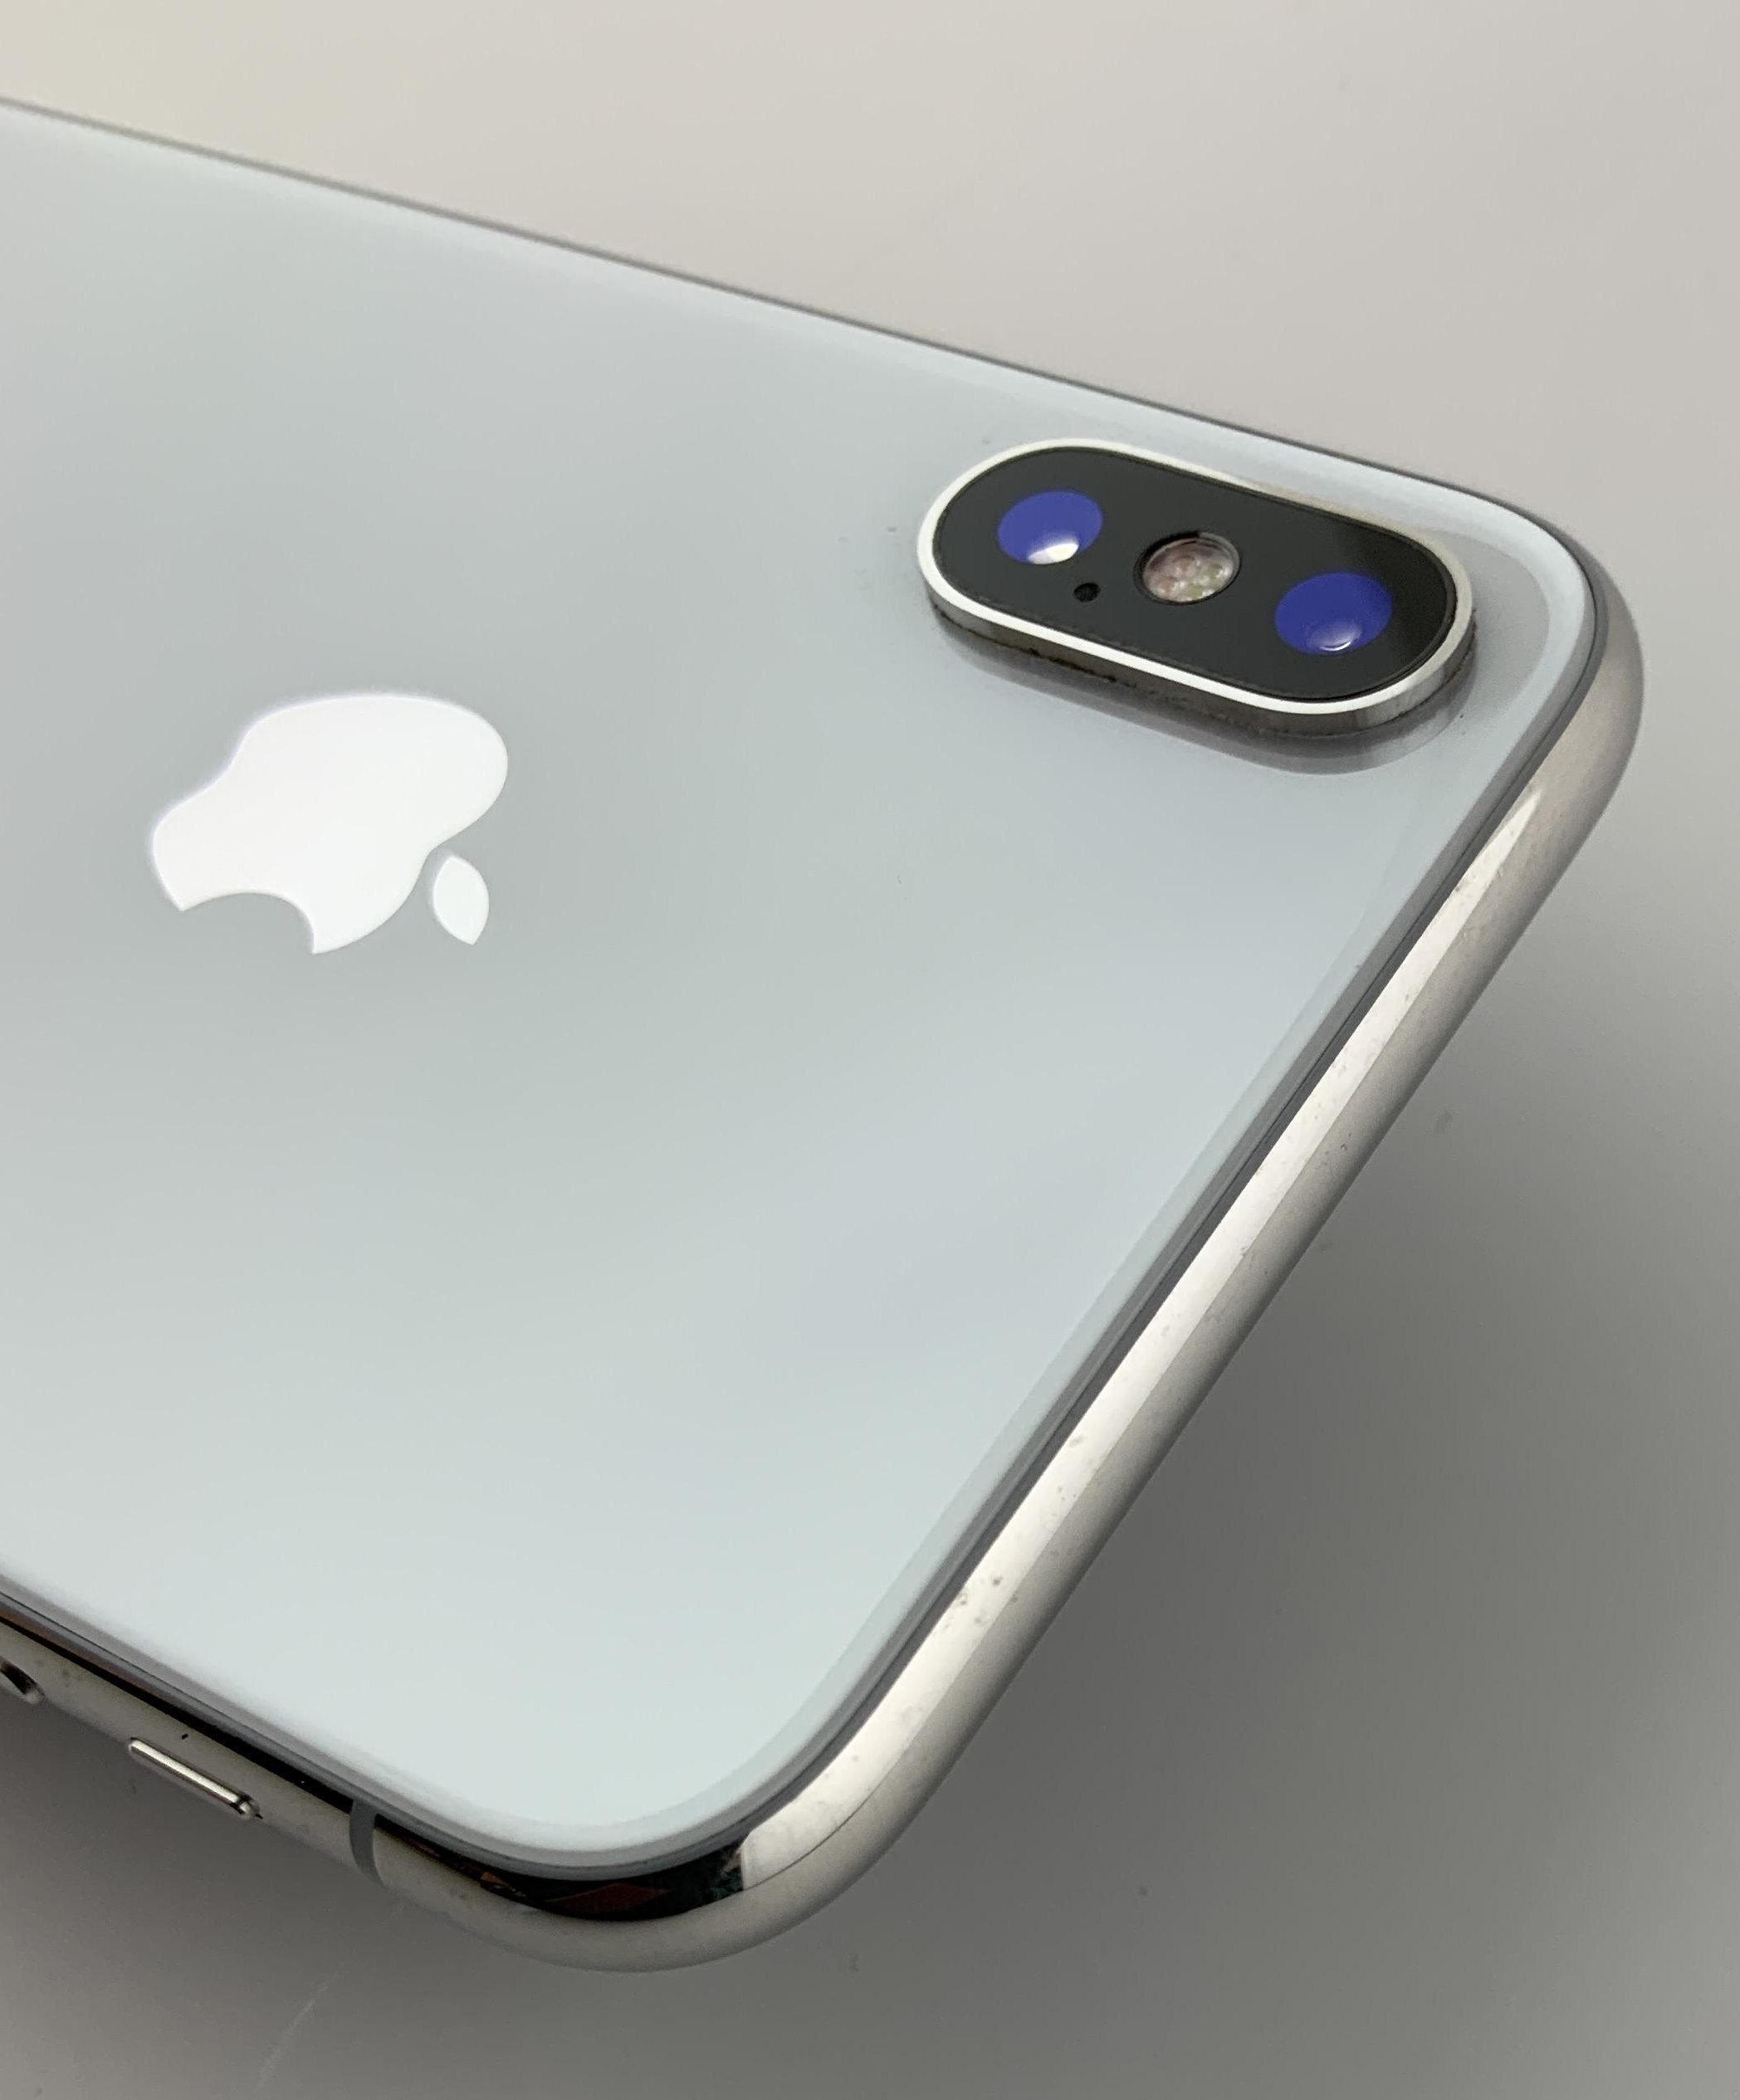 iPhone X 256GB, 256GB, Silver, immagine 3